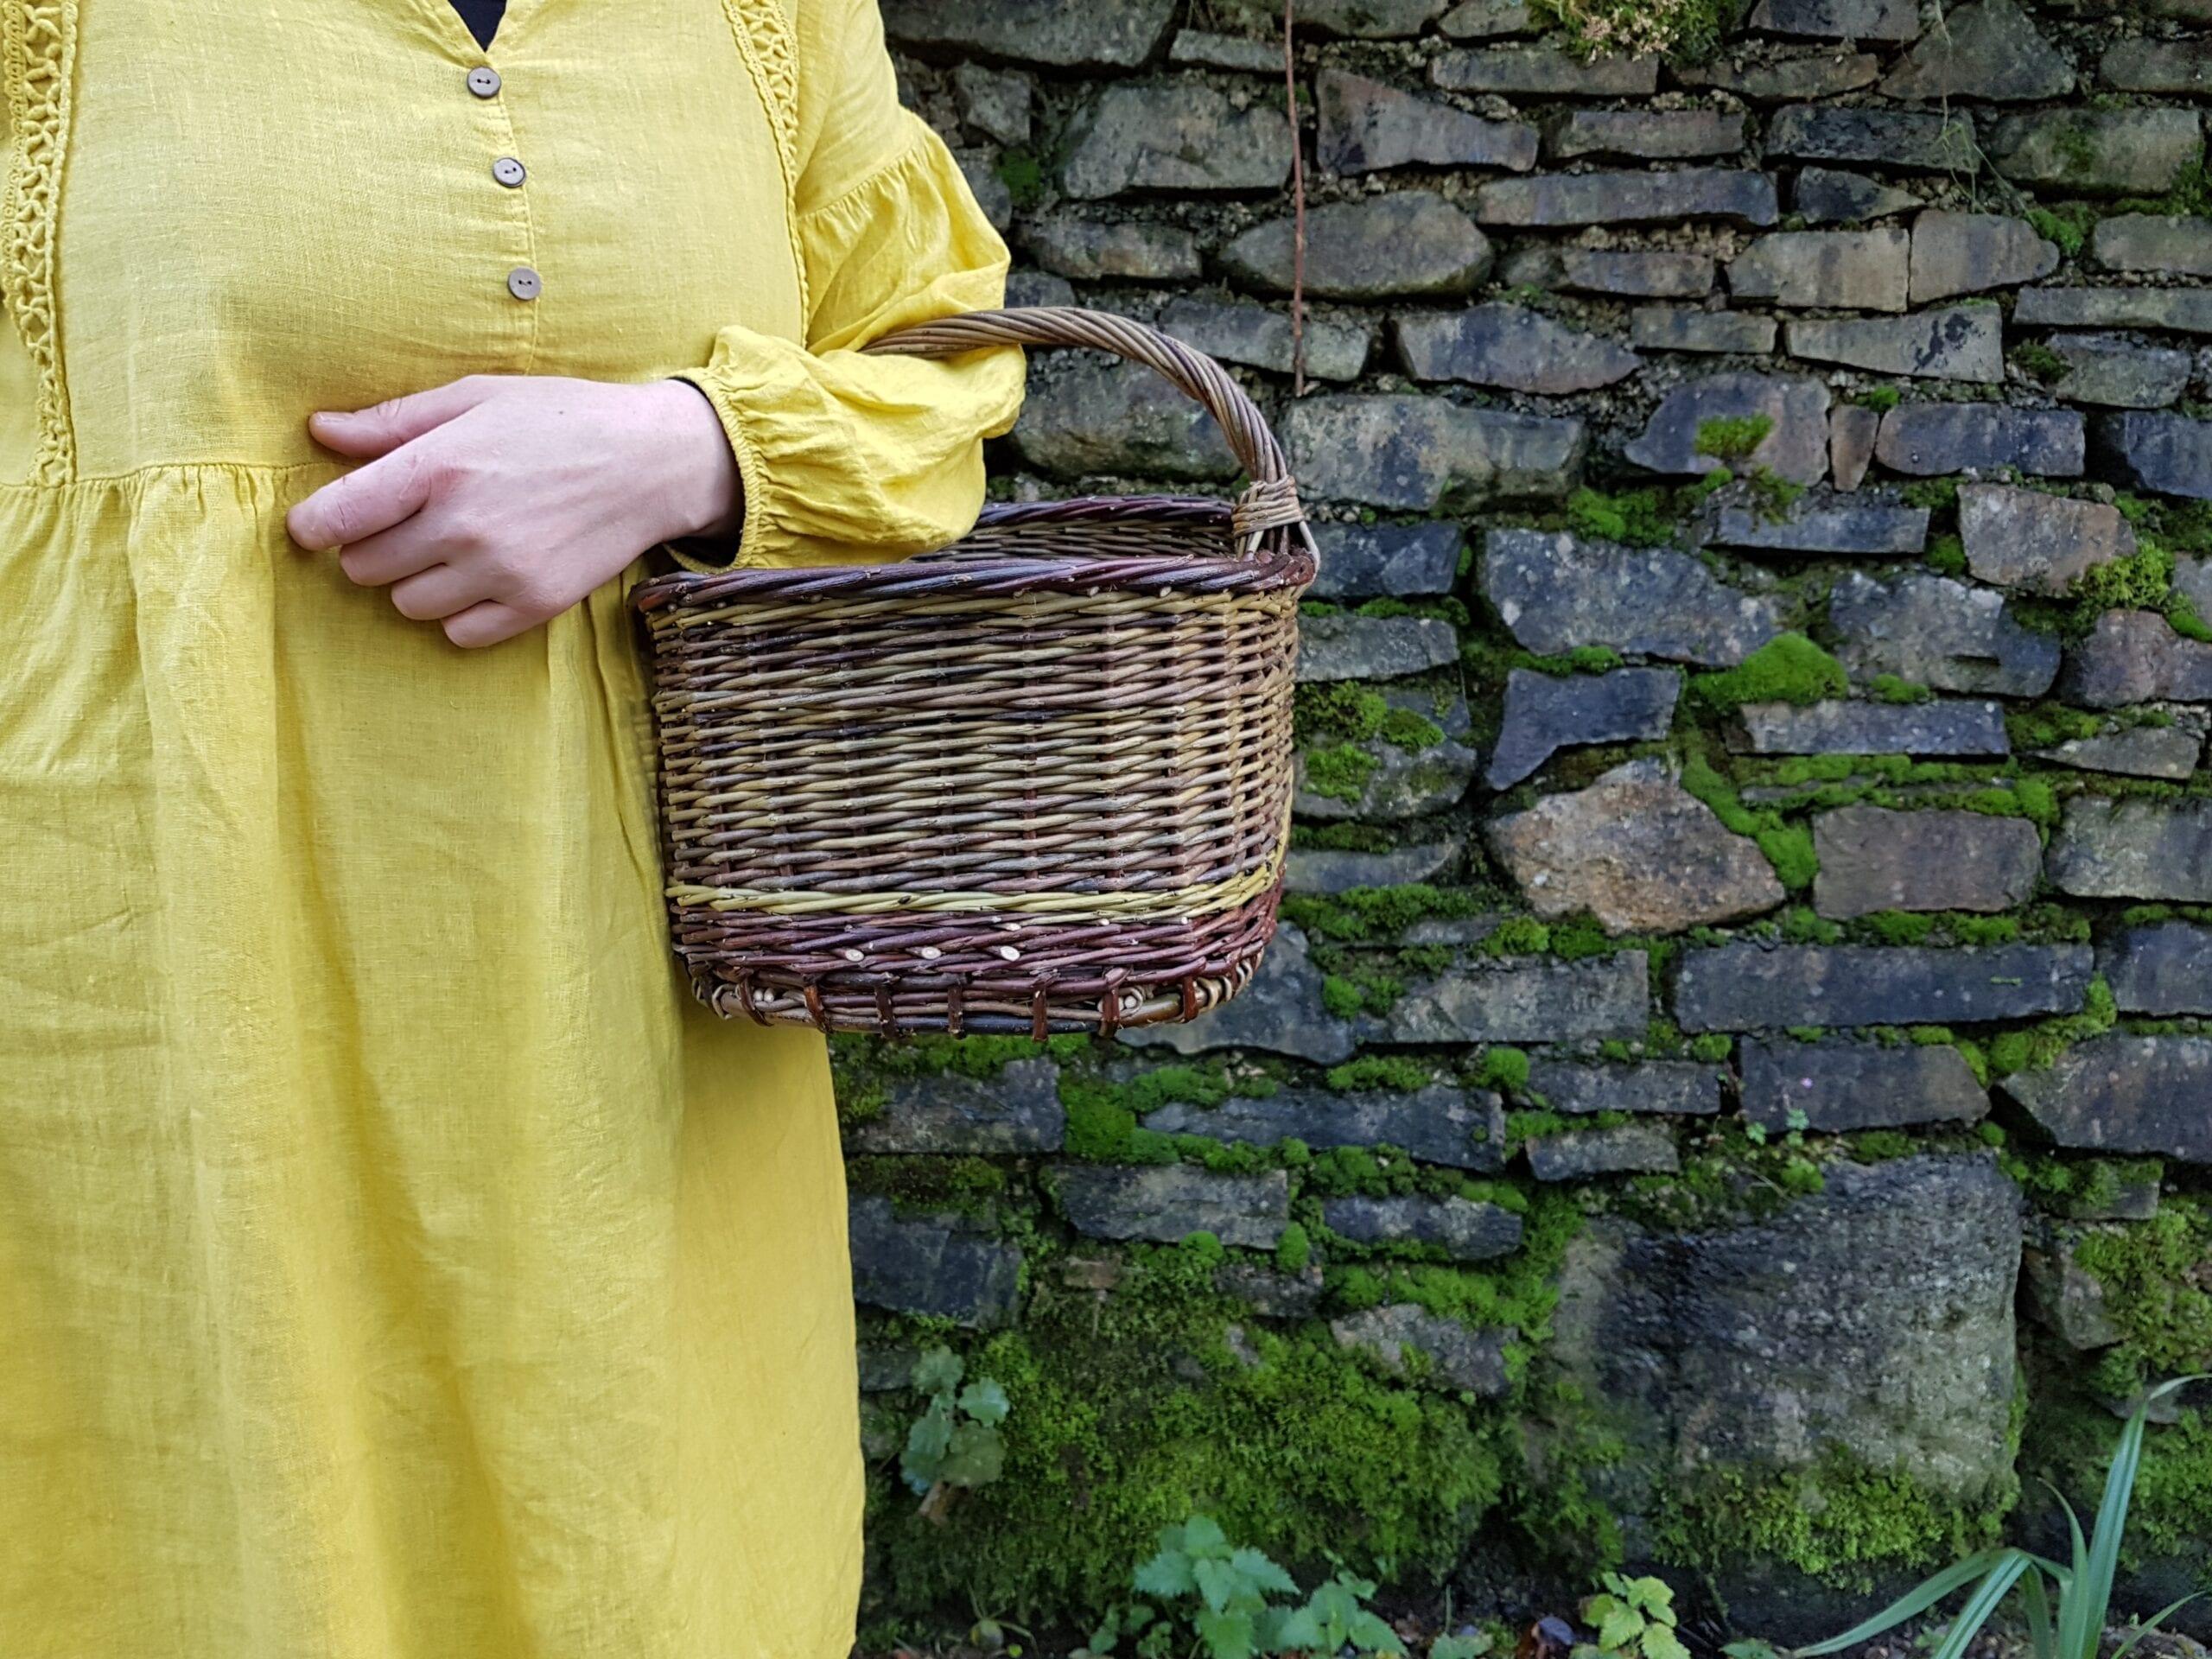 Small woven shopping basket